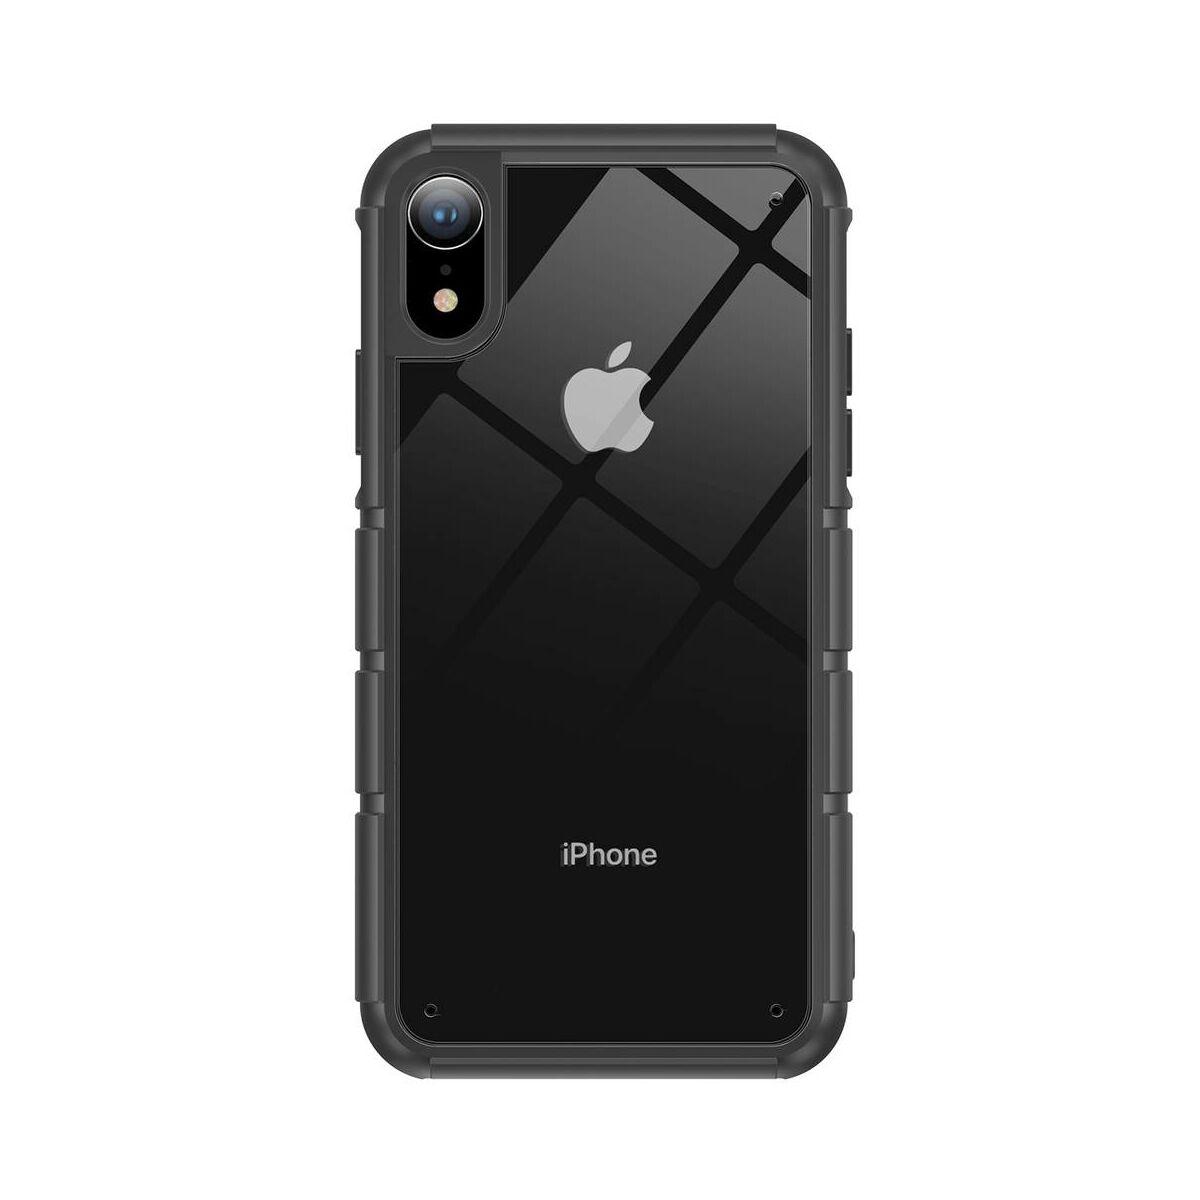 Baseus iPhone XR tok, Panzer, fekete (WIAPIPH61-TK01)